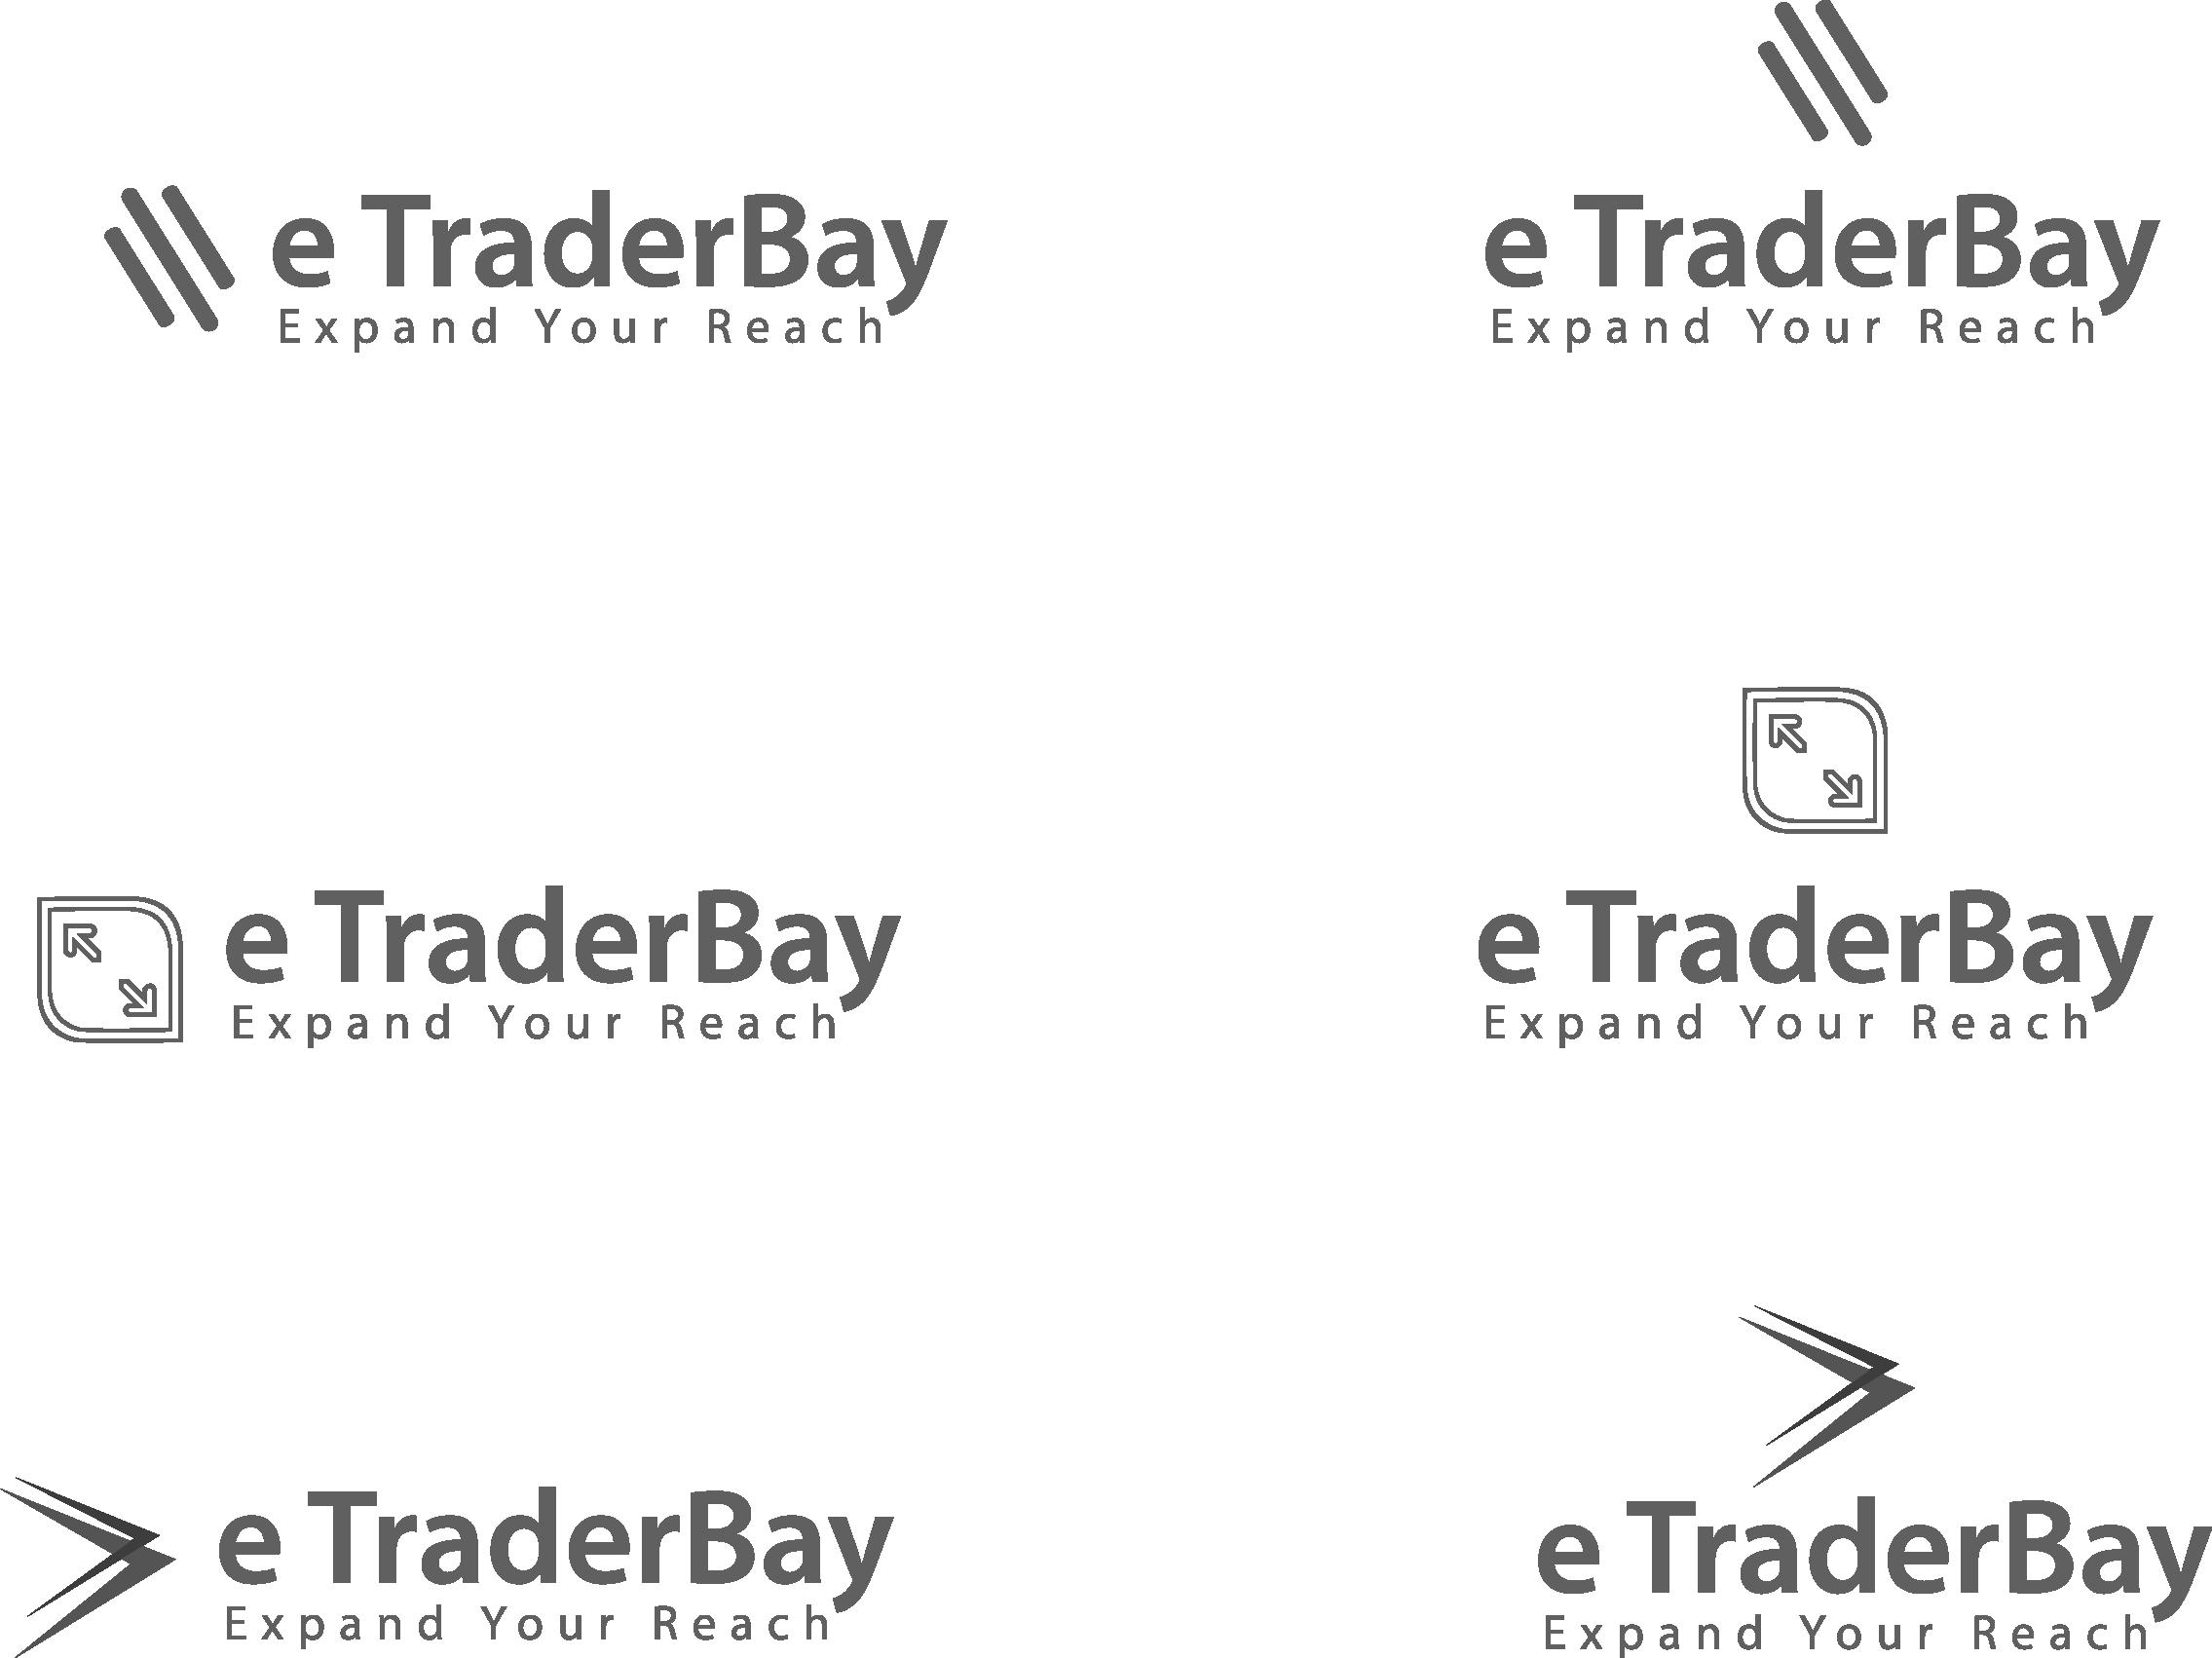 E Trader Logo In 2020 Poster Invitation Card Banner Business Design